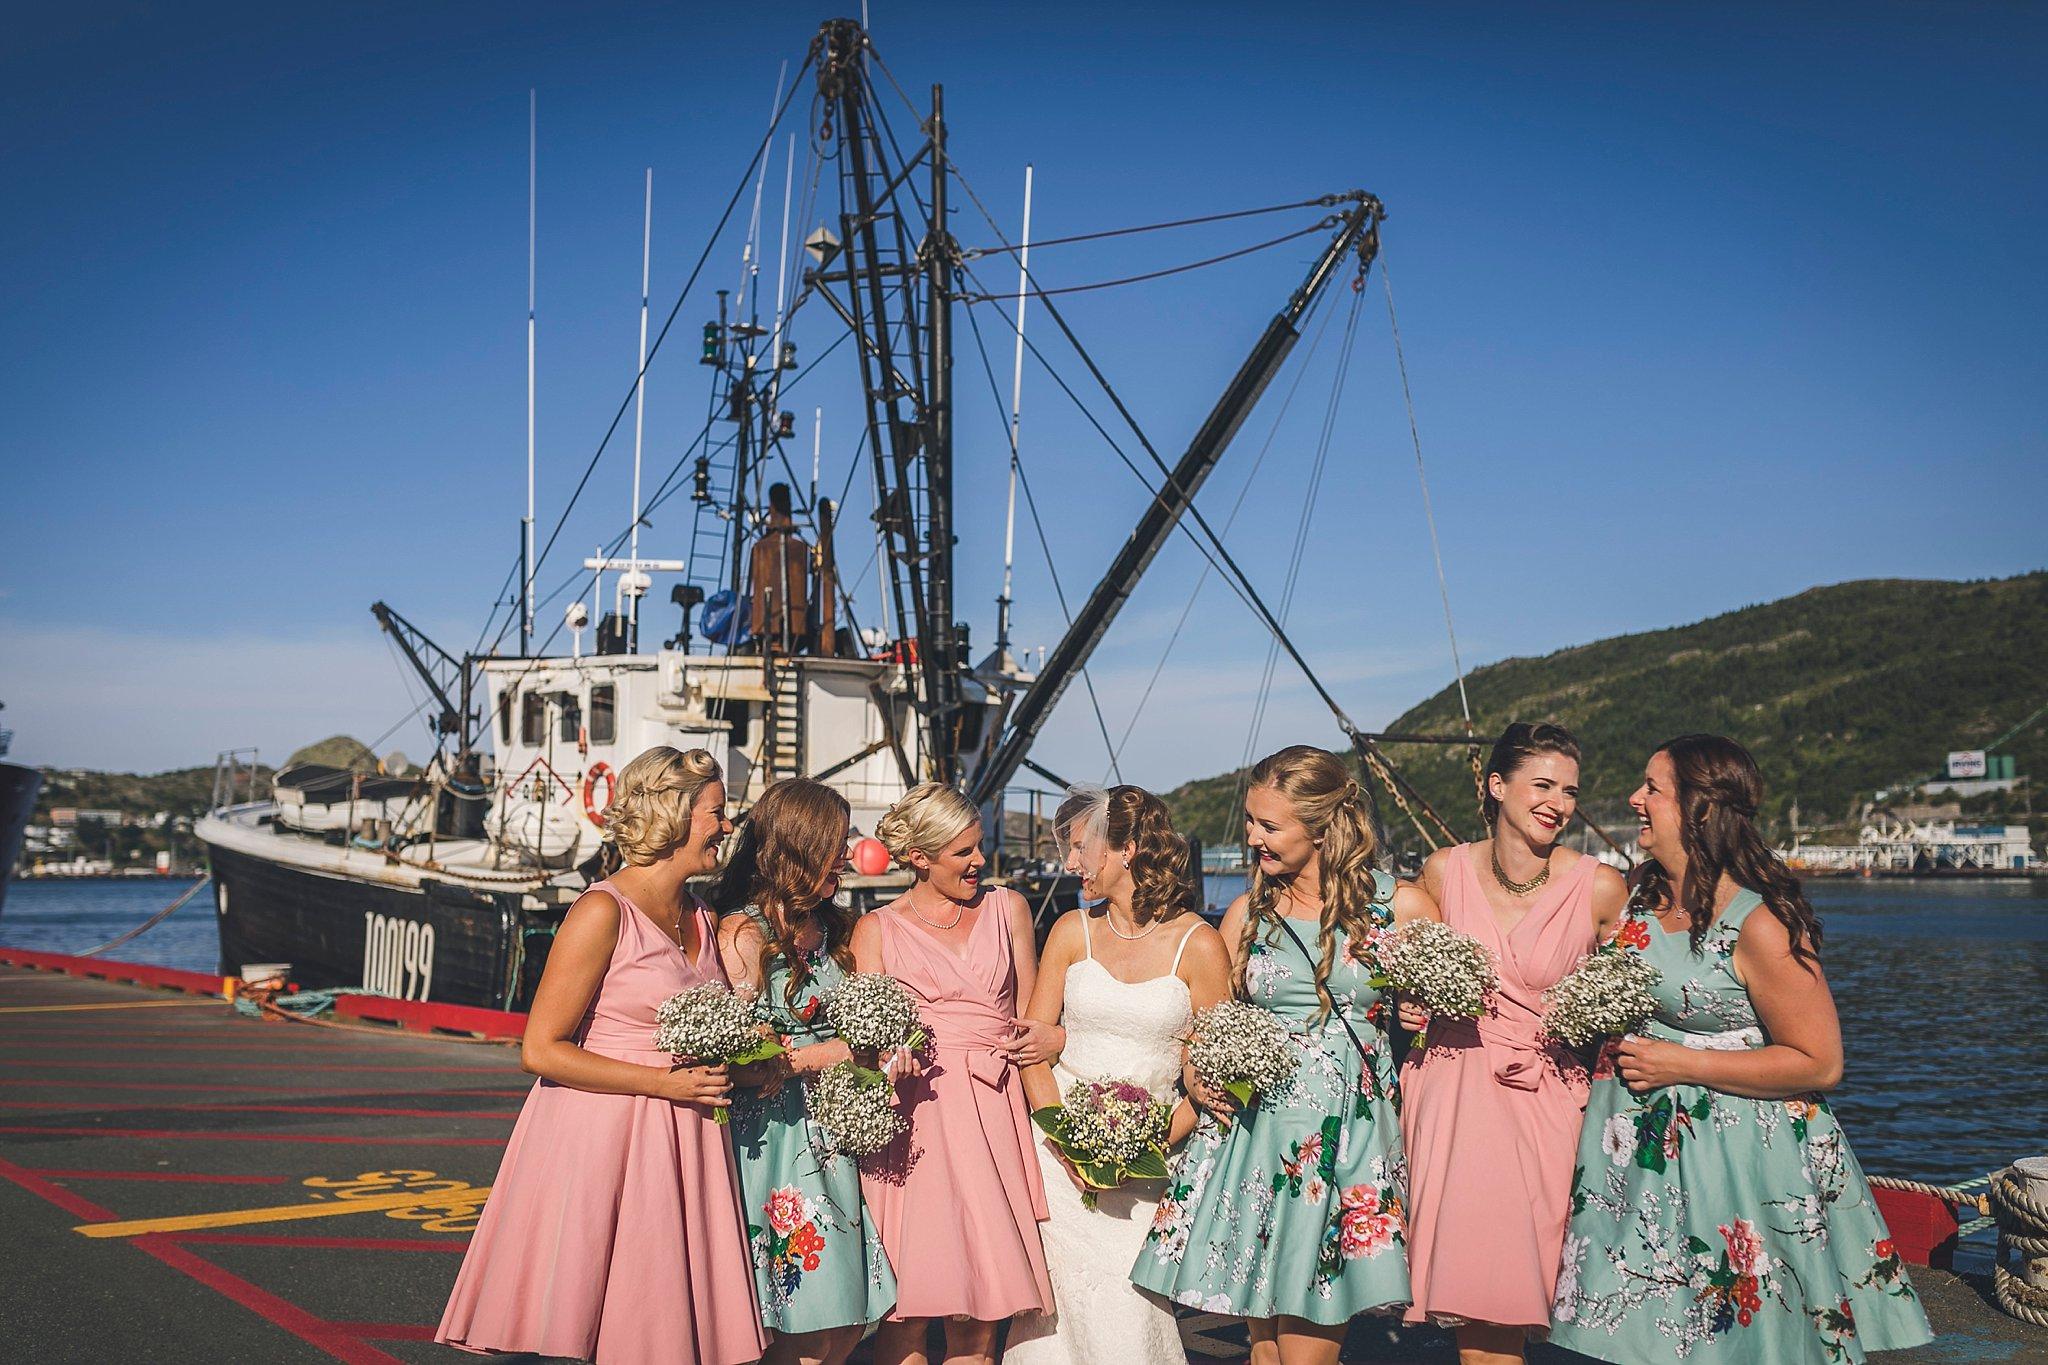 Bride and her bridesmaids before a St. John's, Newfoundland wedding